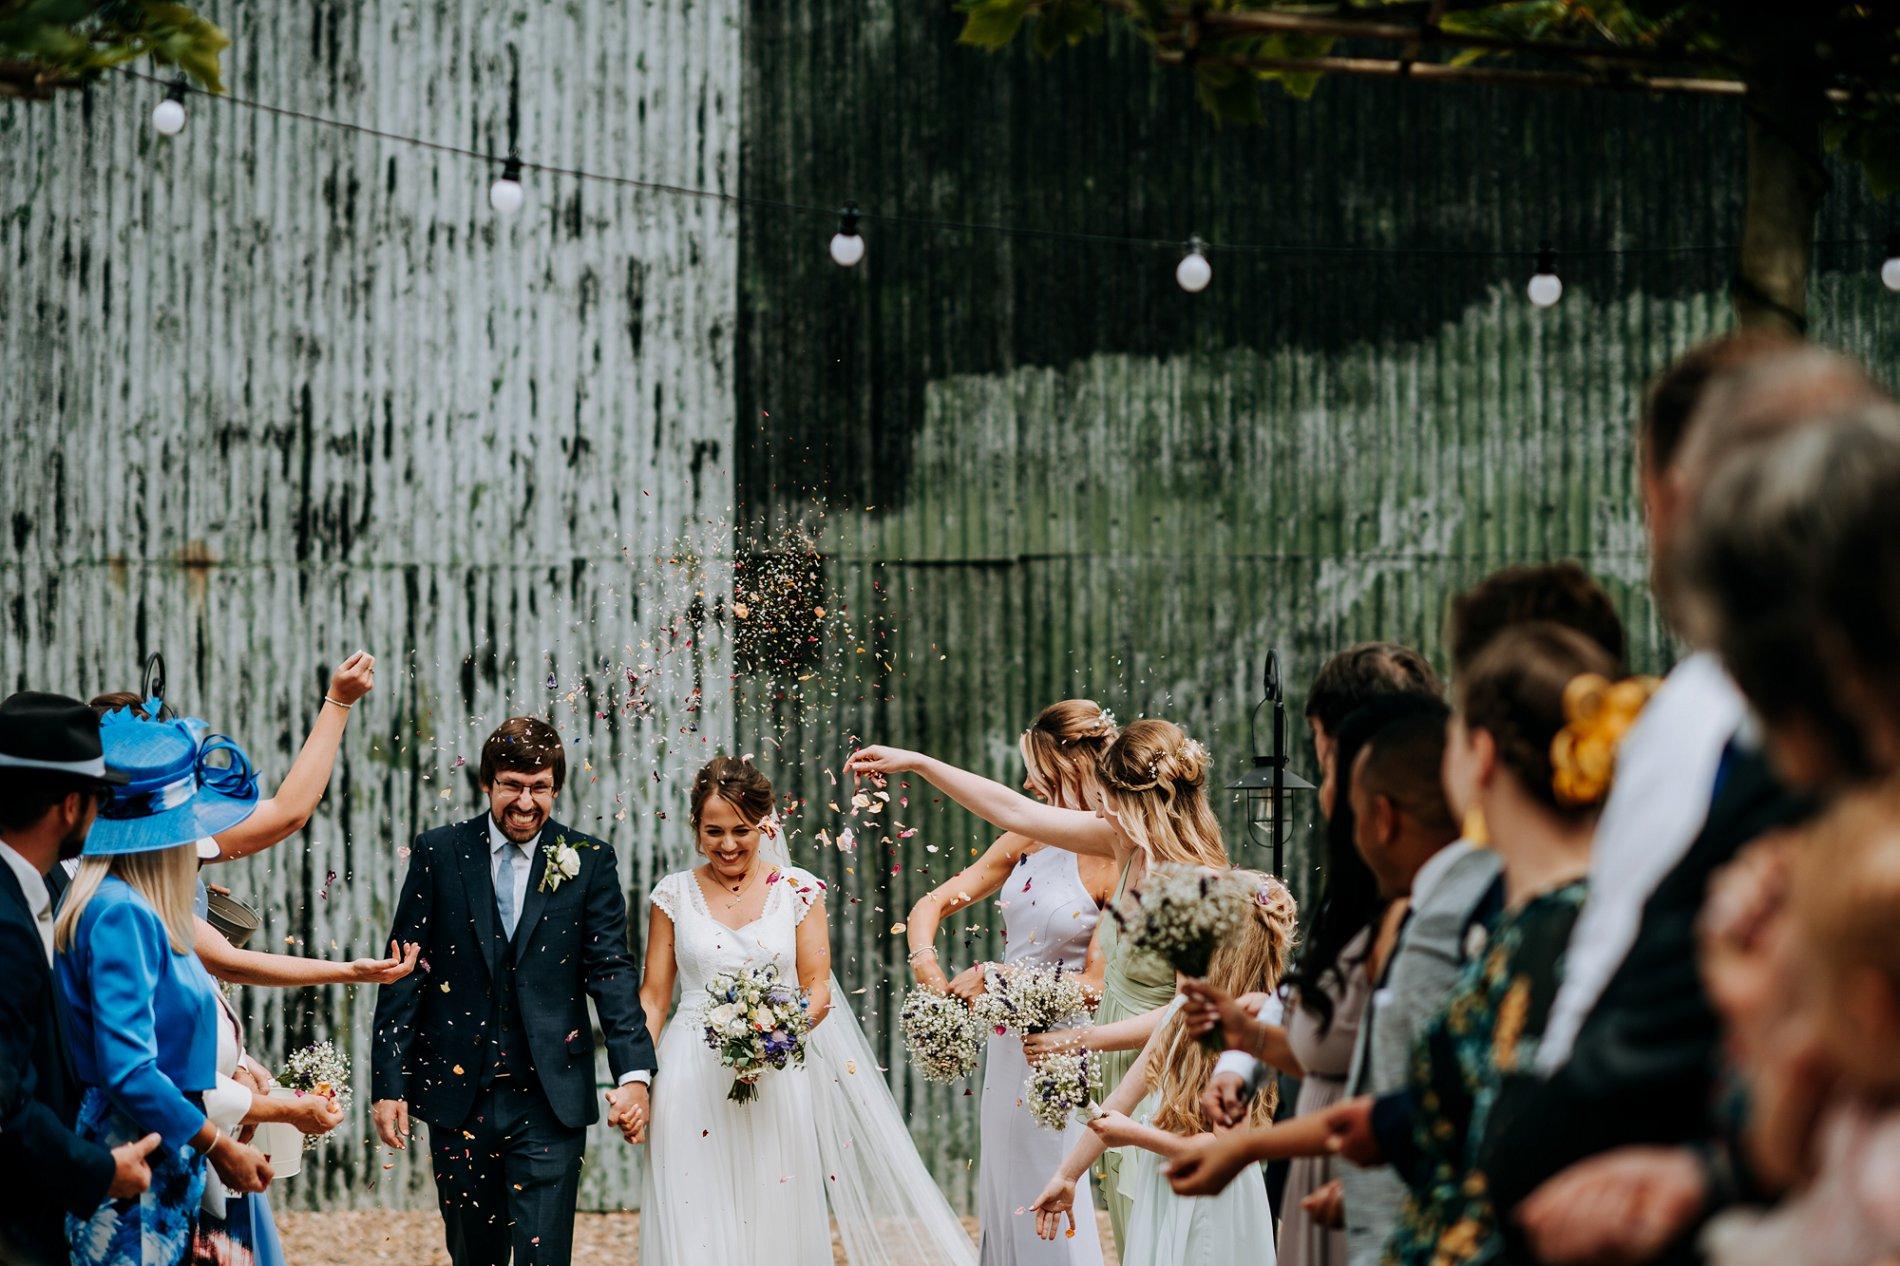 M & G Wedding Photography (15)